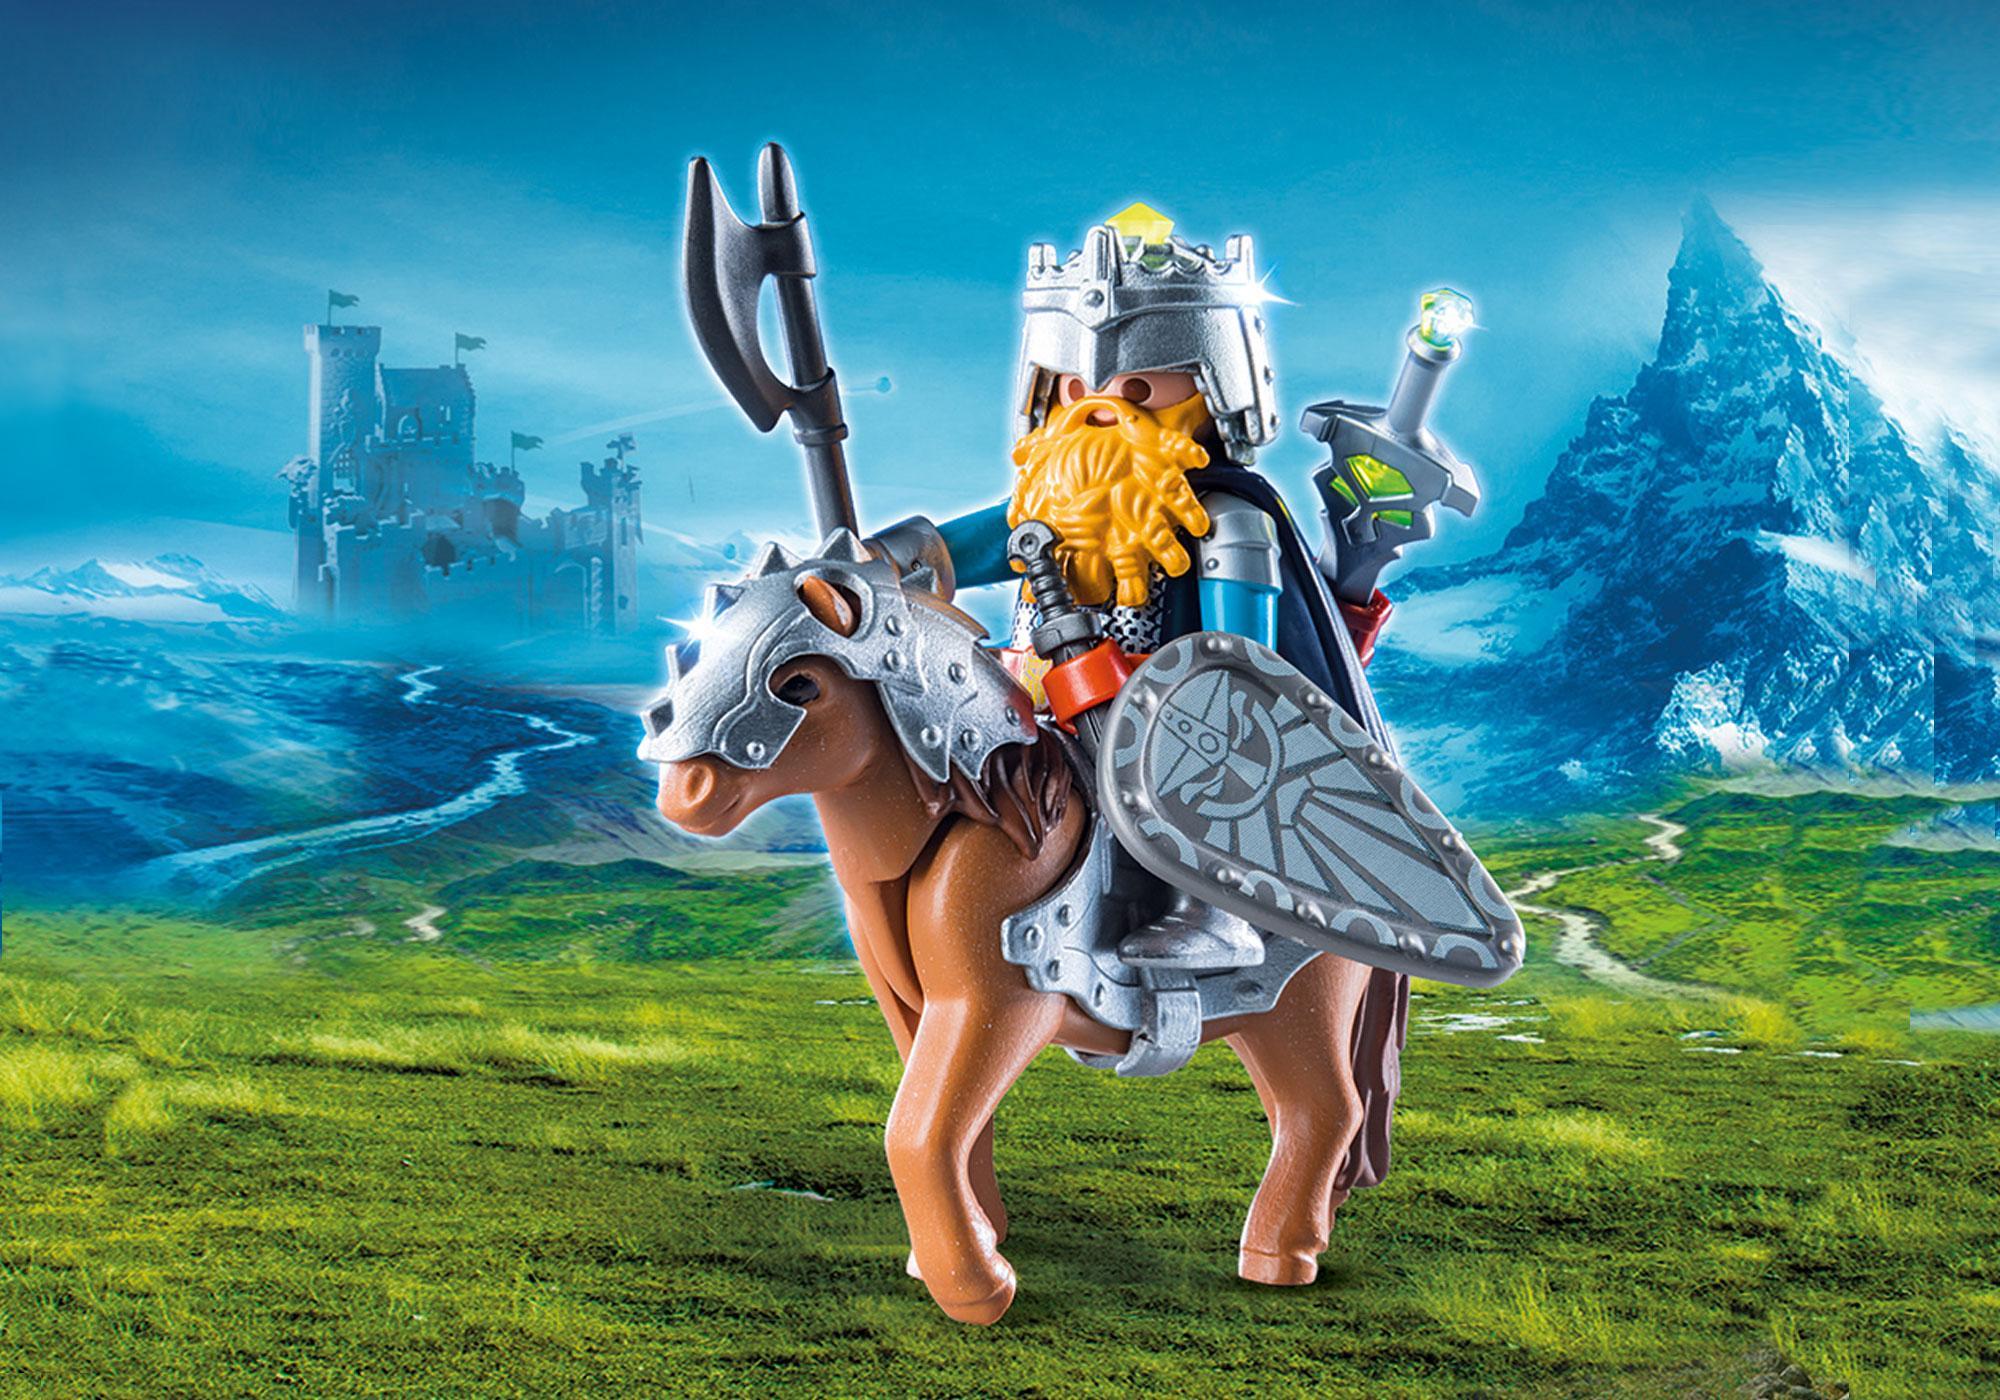 9345_product_detail/Combattant nain et poney